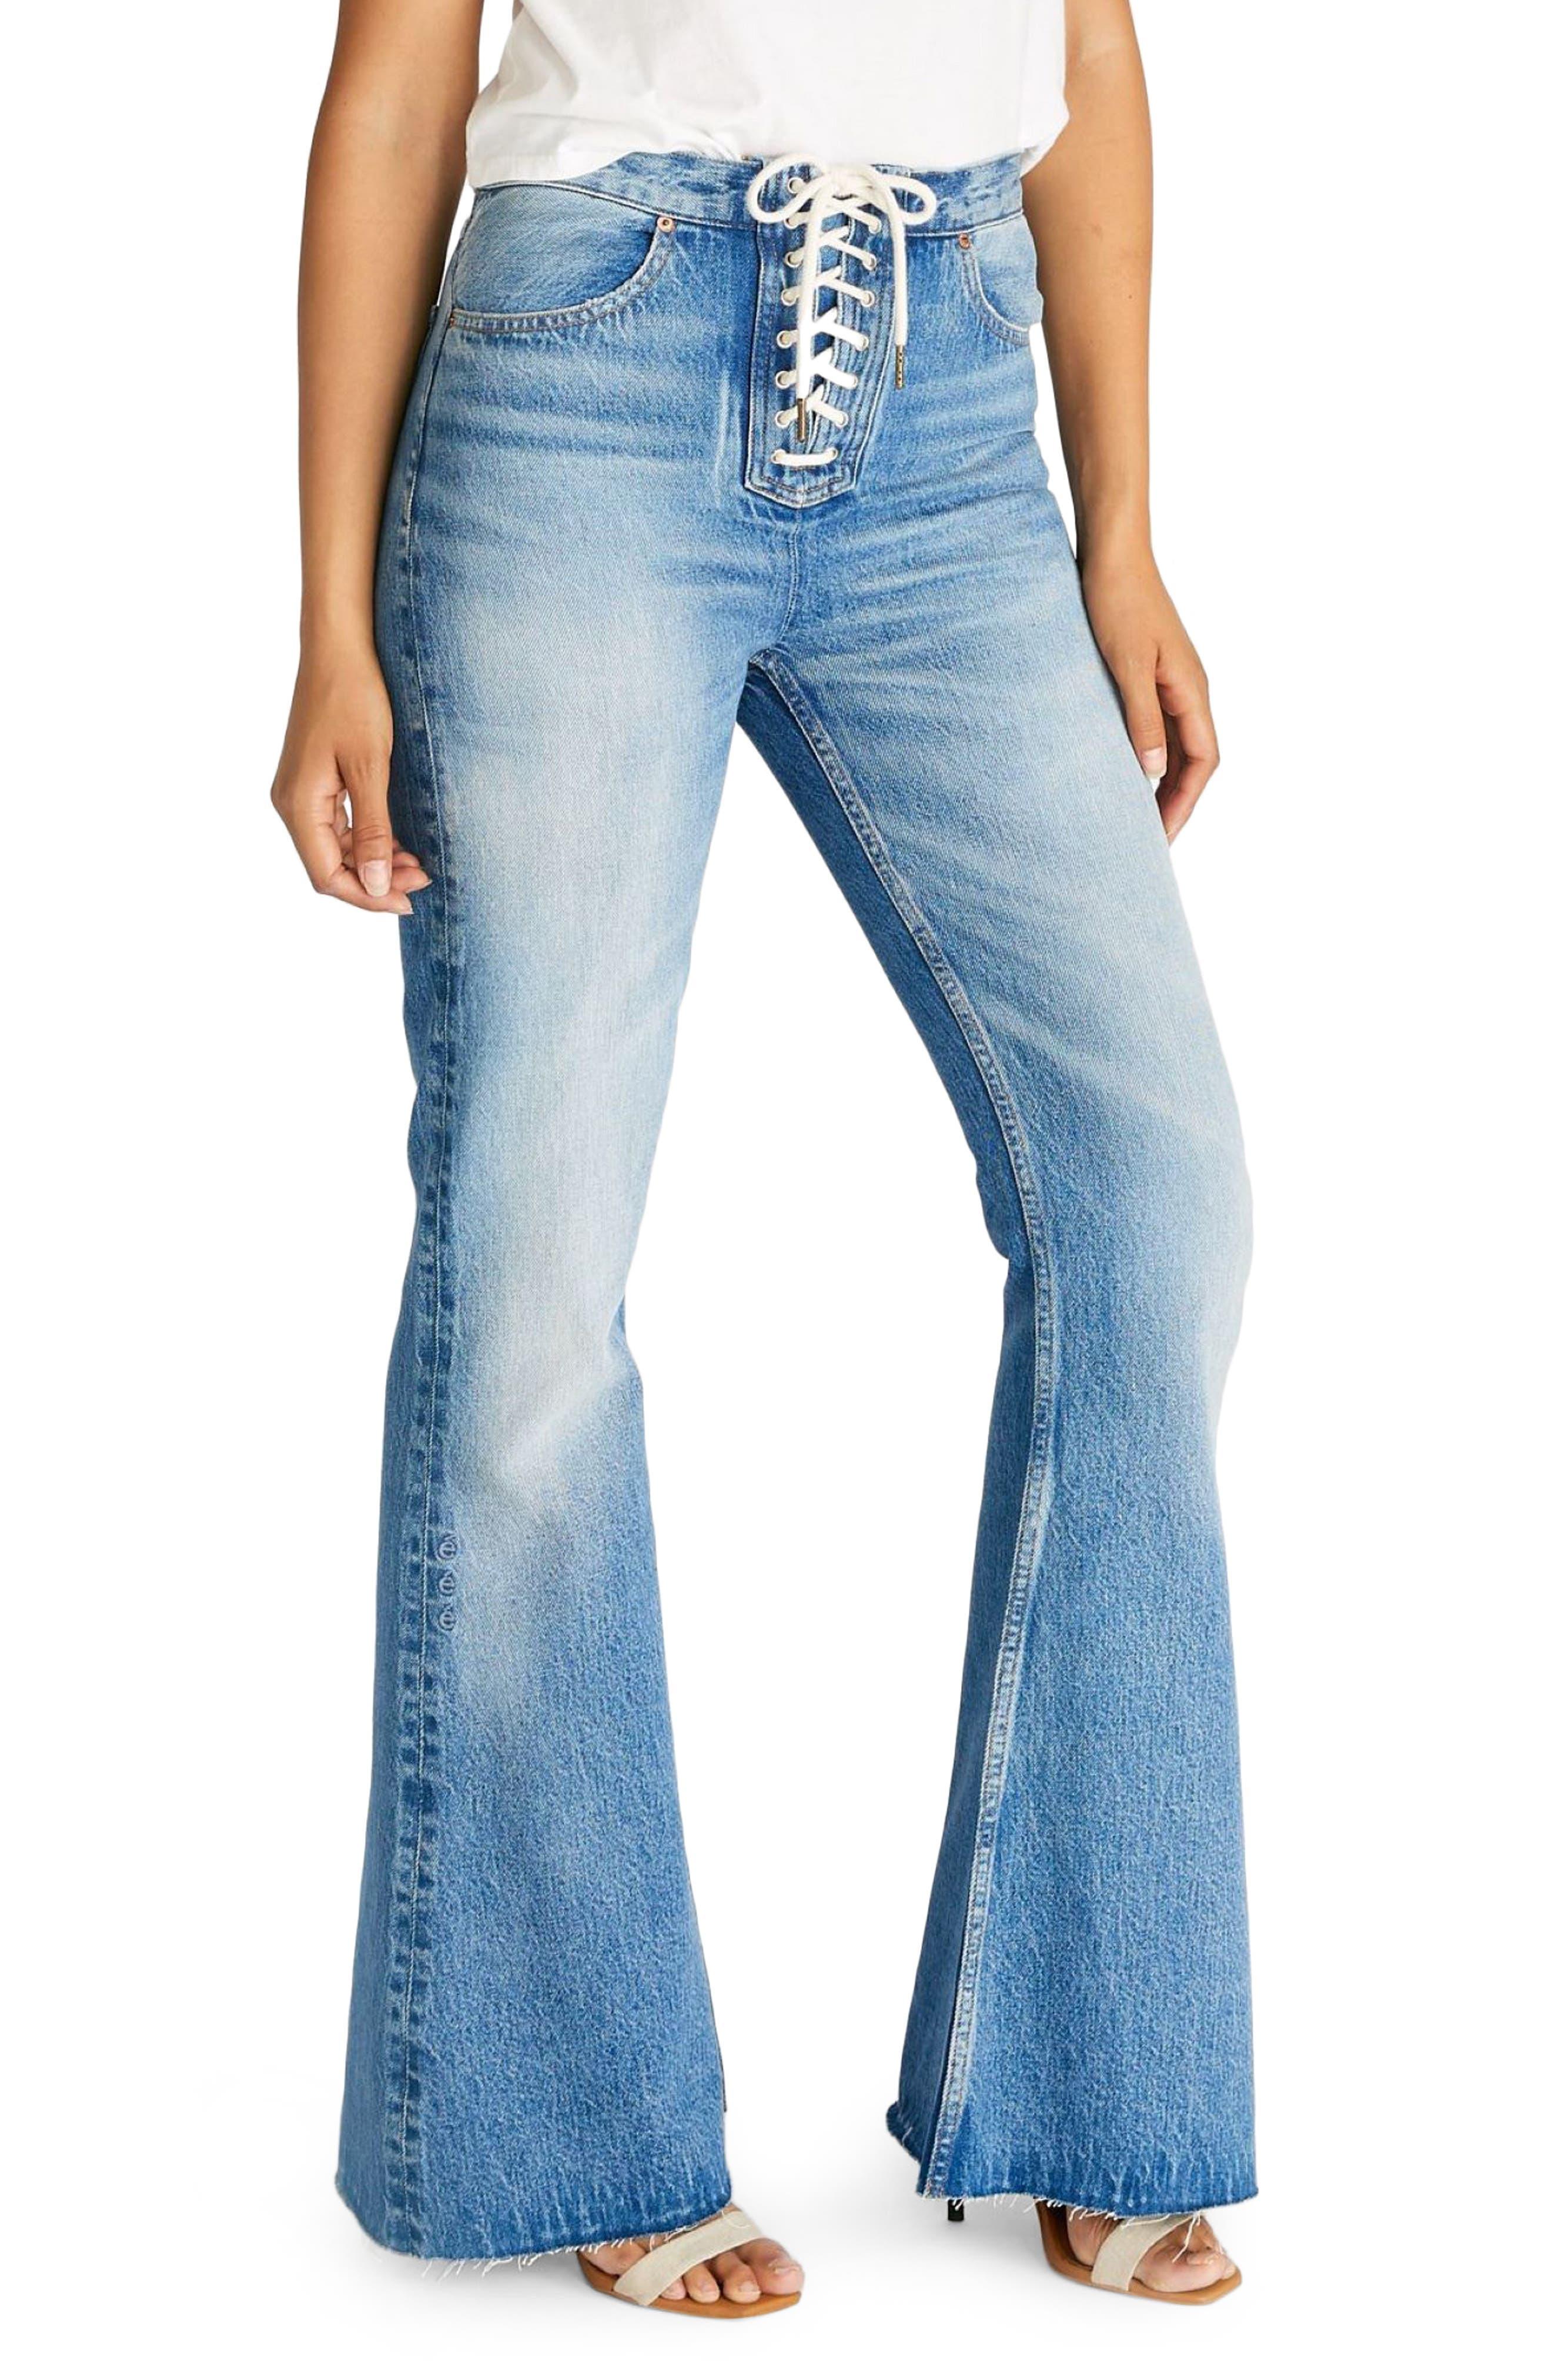 60s Pants, Jeans, Hippie, Flares, Jumpsuits ETICA Nina Lace-Up Flare Leg Jeans Size 31 in Cottonwood Creek at Nordstrom Rack $59.97 AT vintagedancer.com